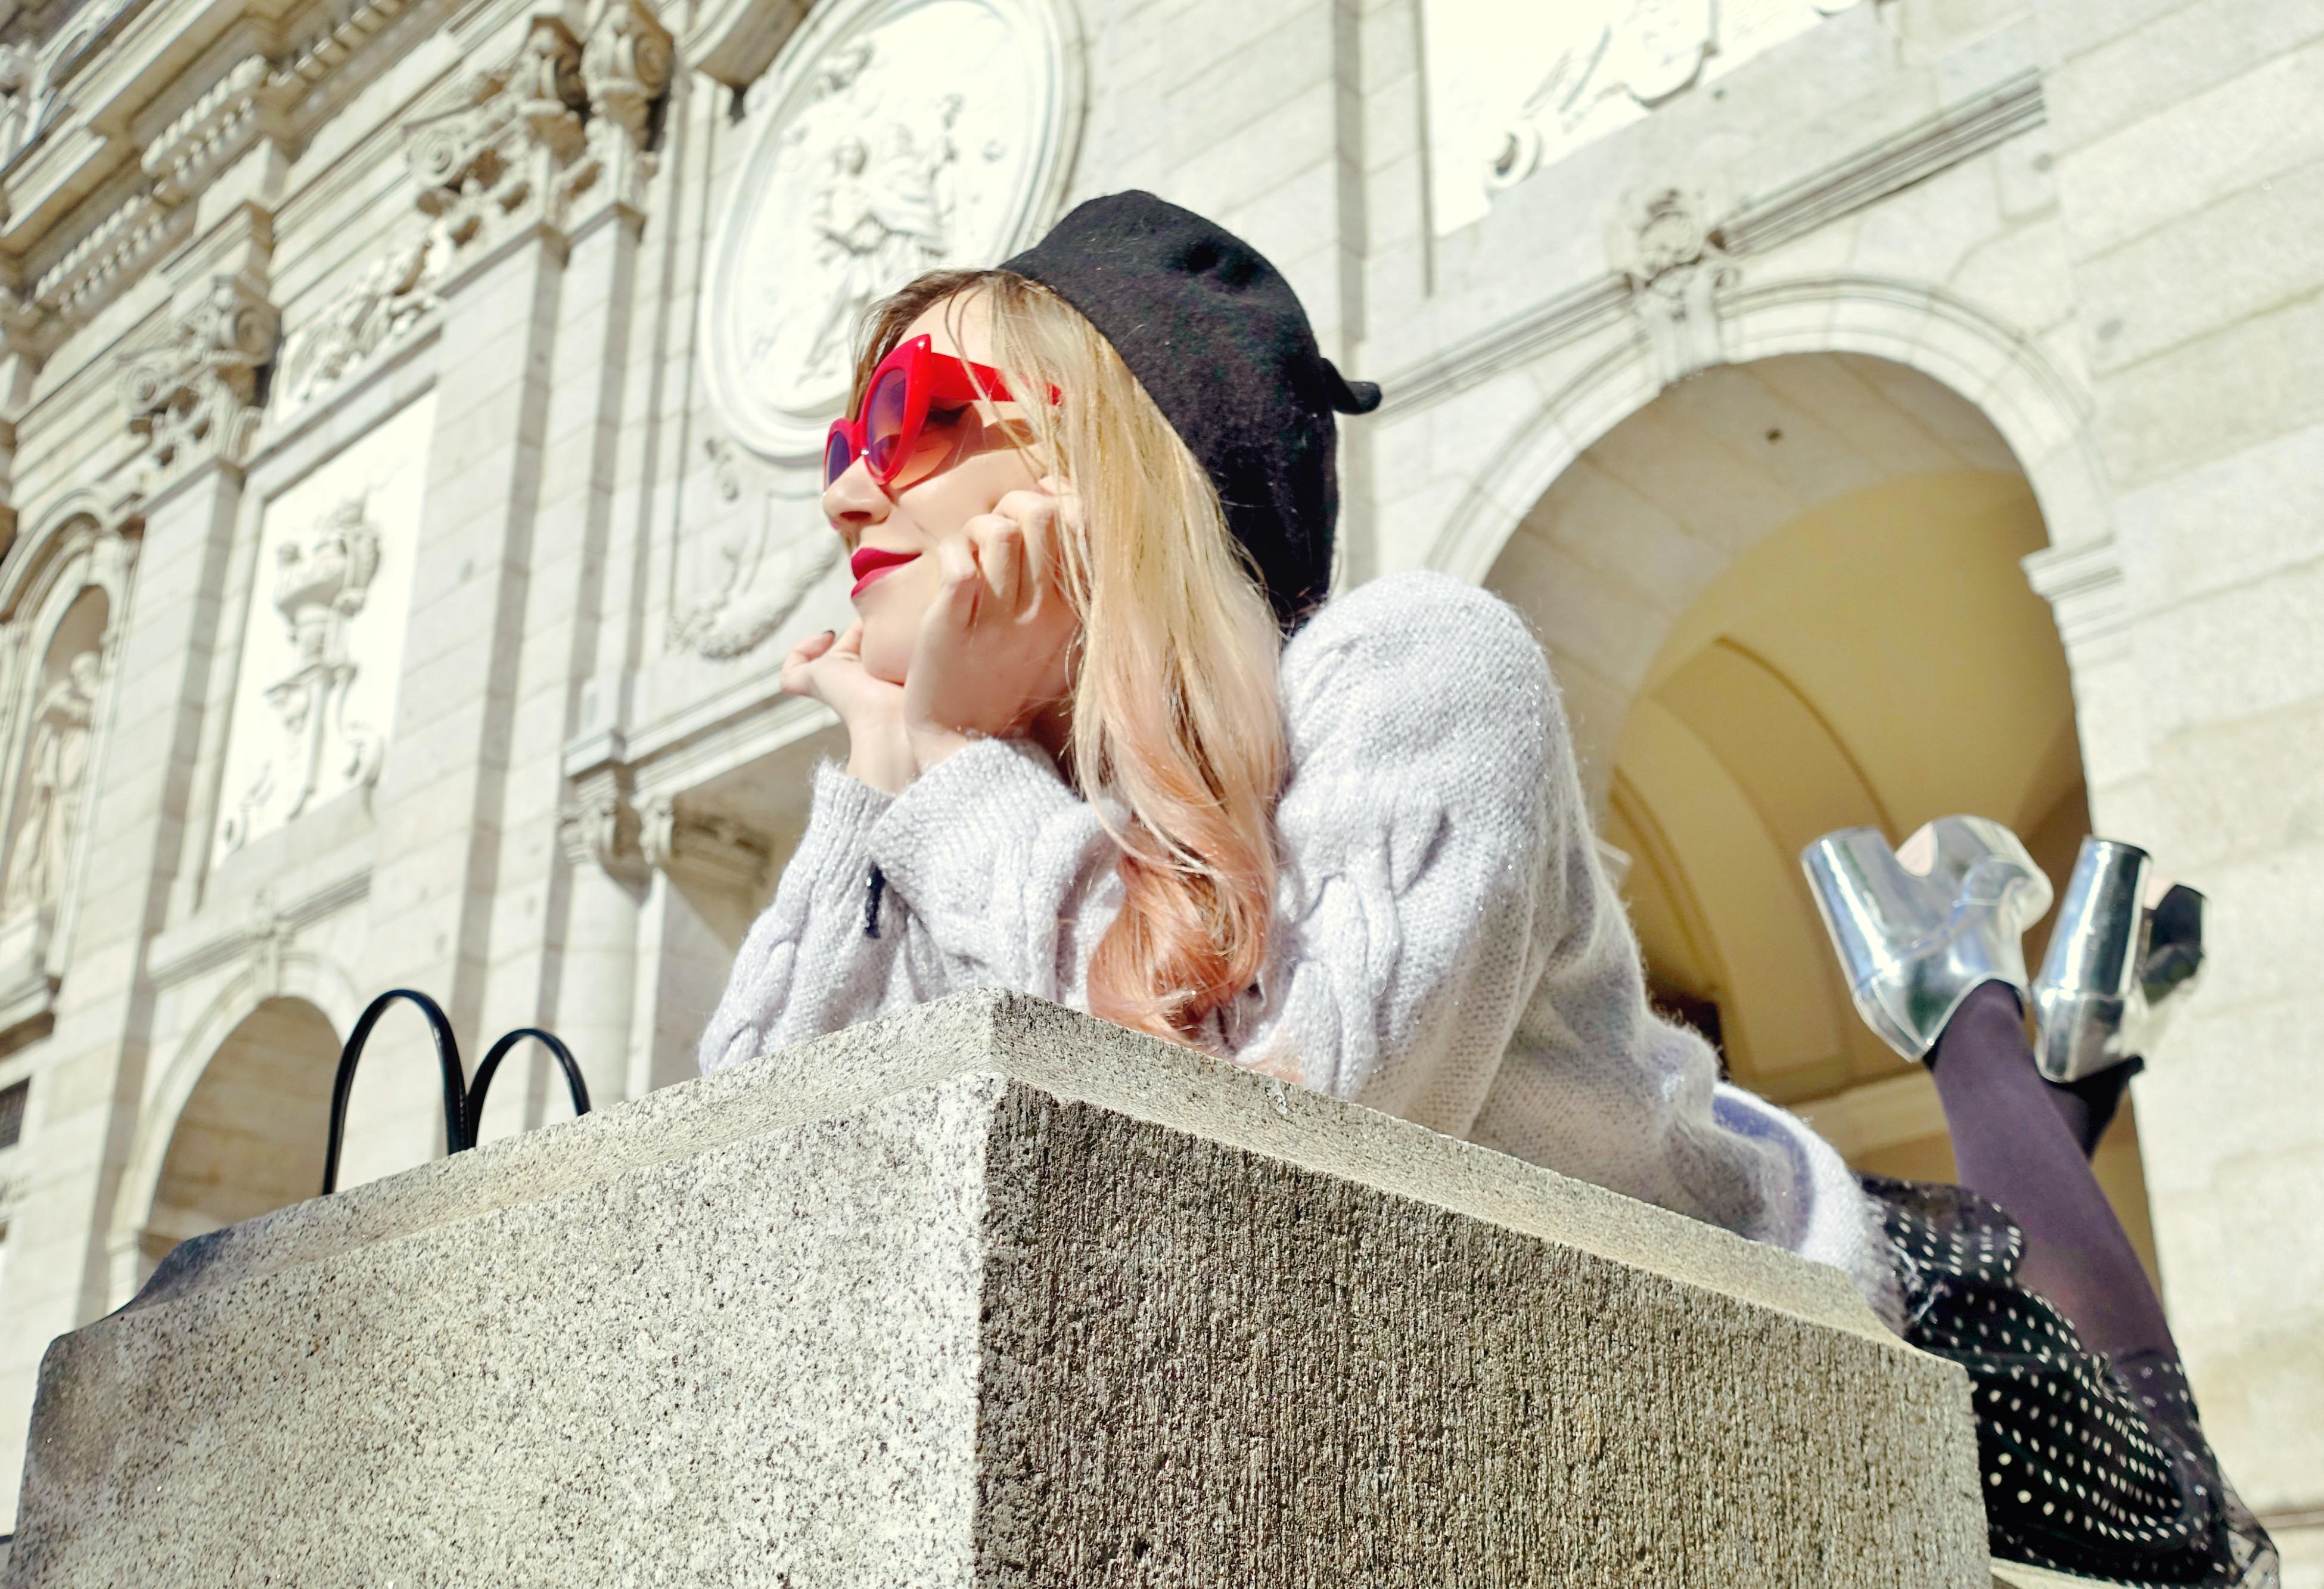 Blog-de-moda-ChicAdicta-fashionista-laliblue-accesorios-retro-style-primark-dress-polkadot-outfit-influencer-Chic-Adicta-PiensaenChic-Piensa-en-Chic